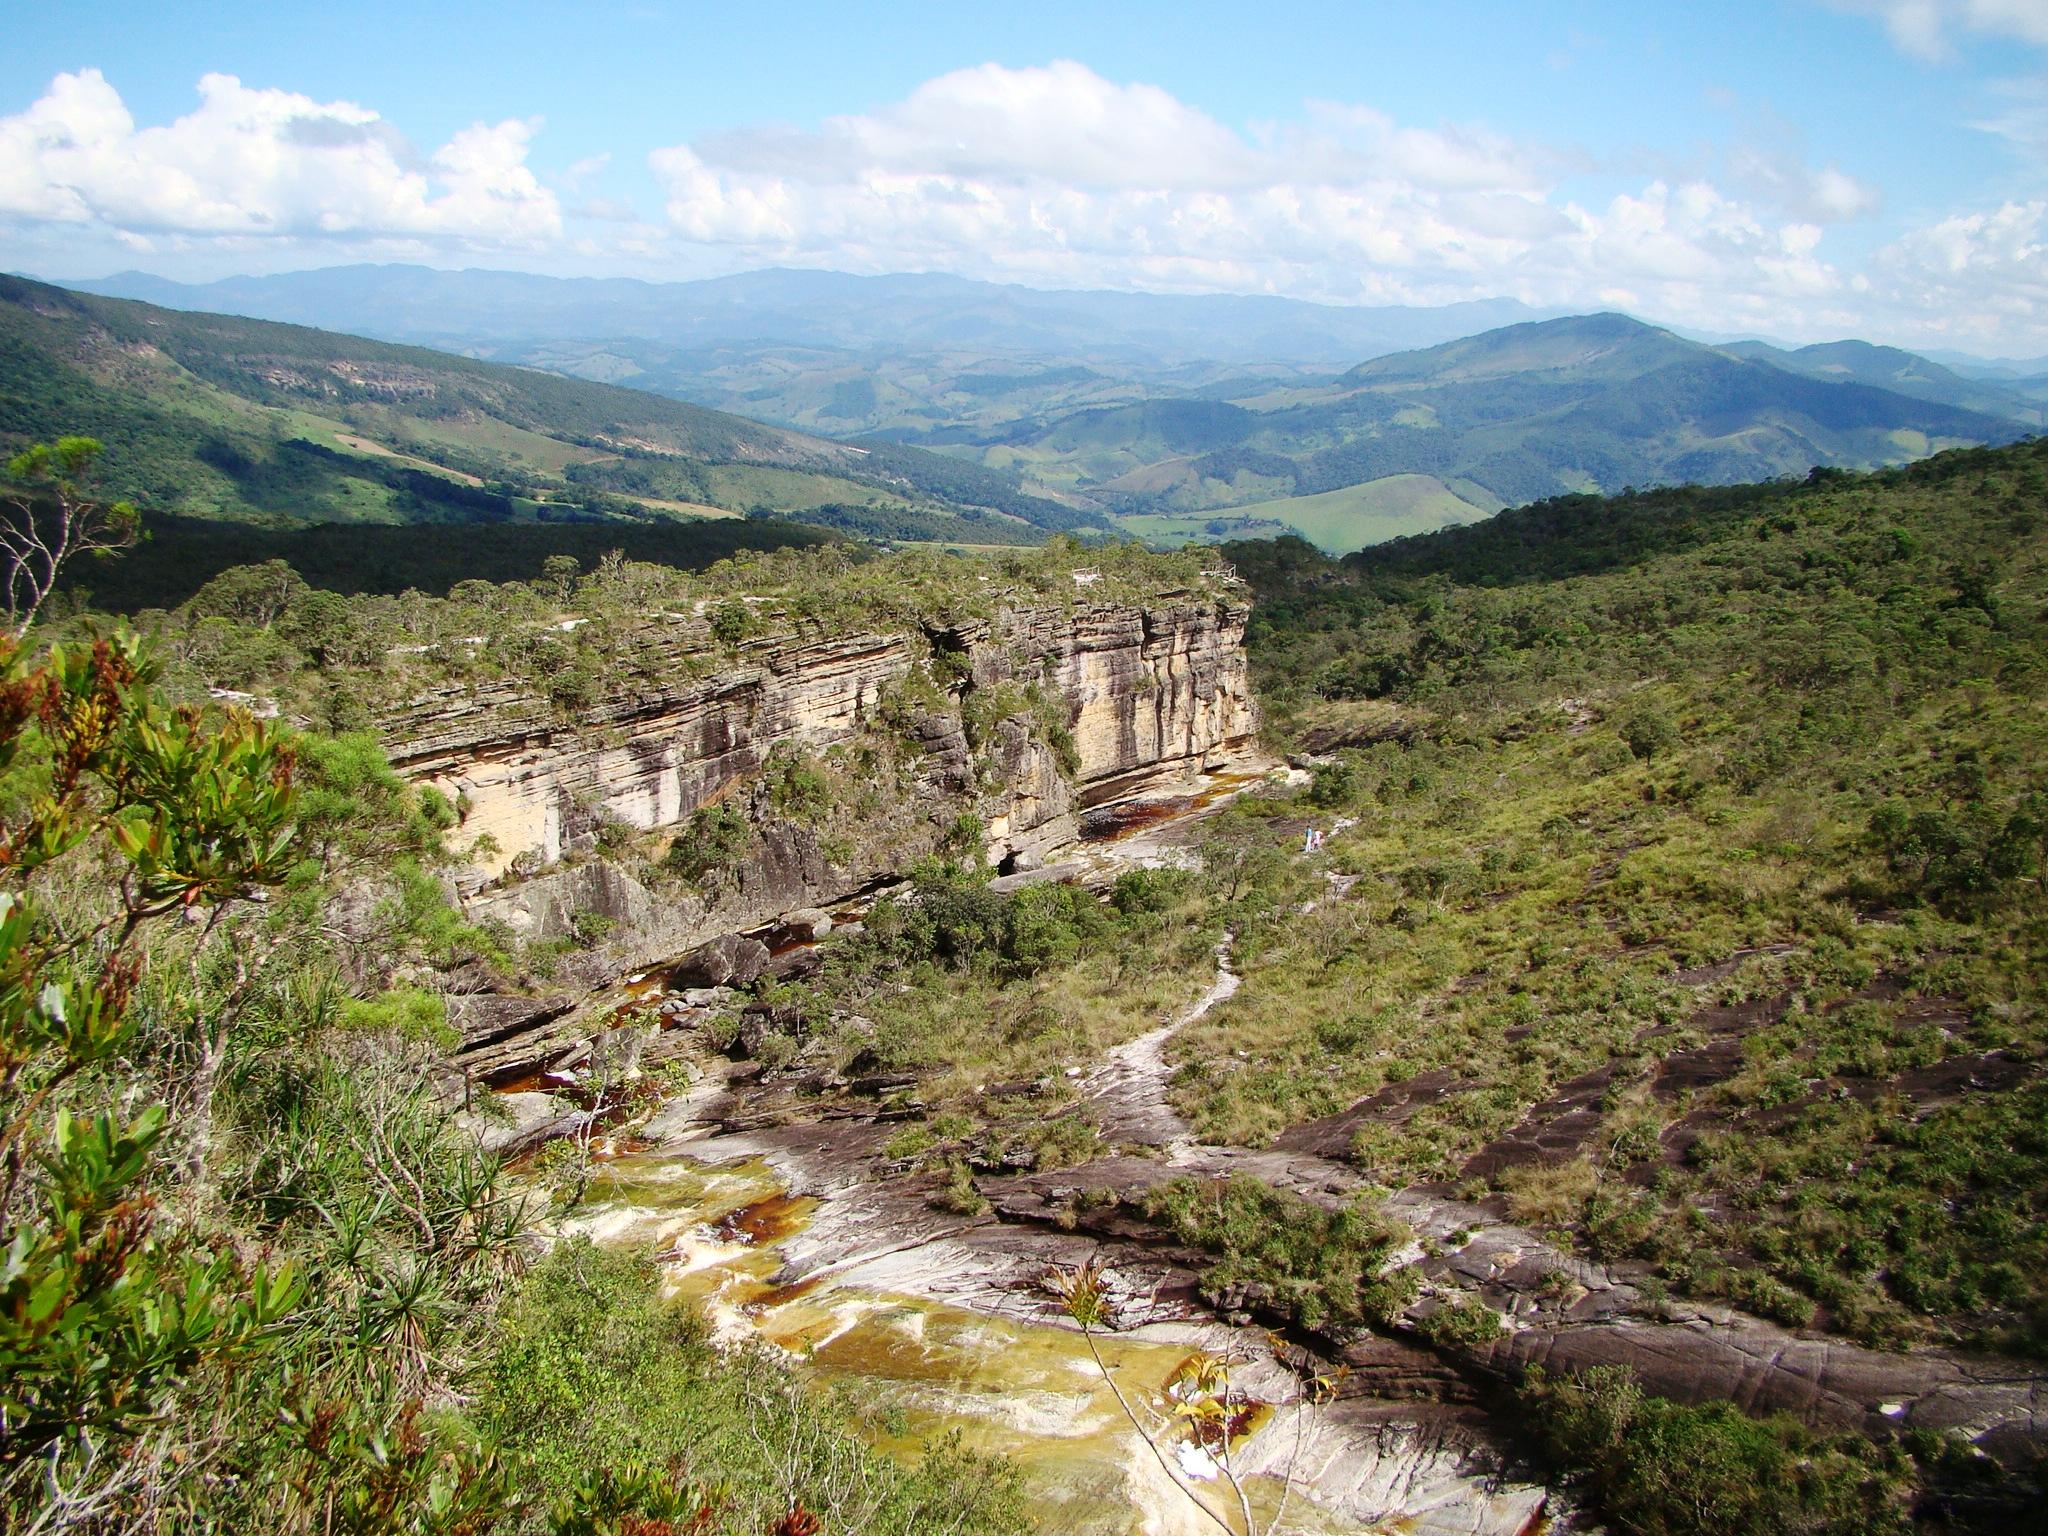 Paredão de Santo Antonio